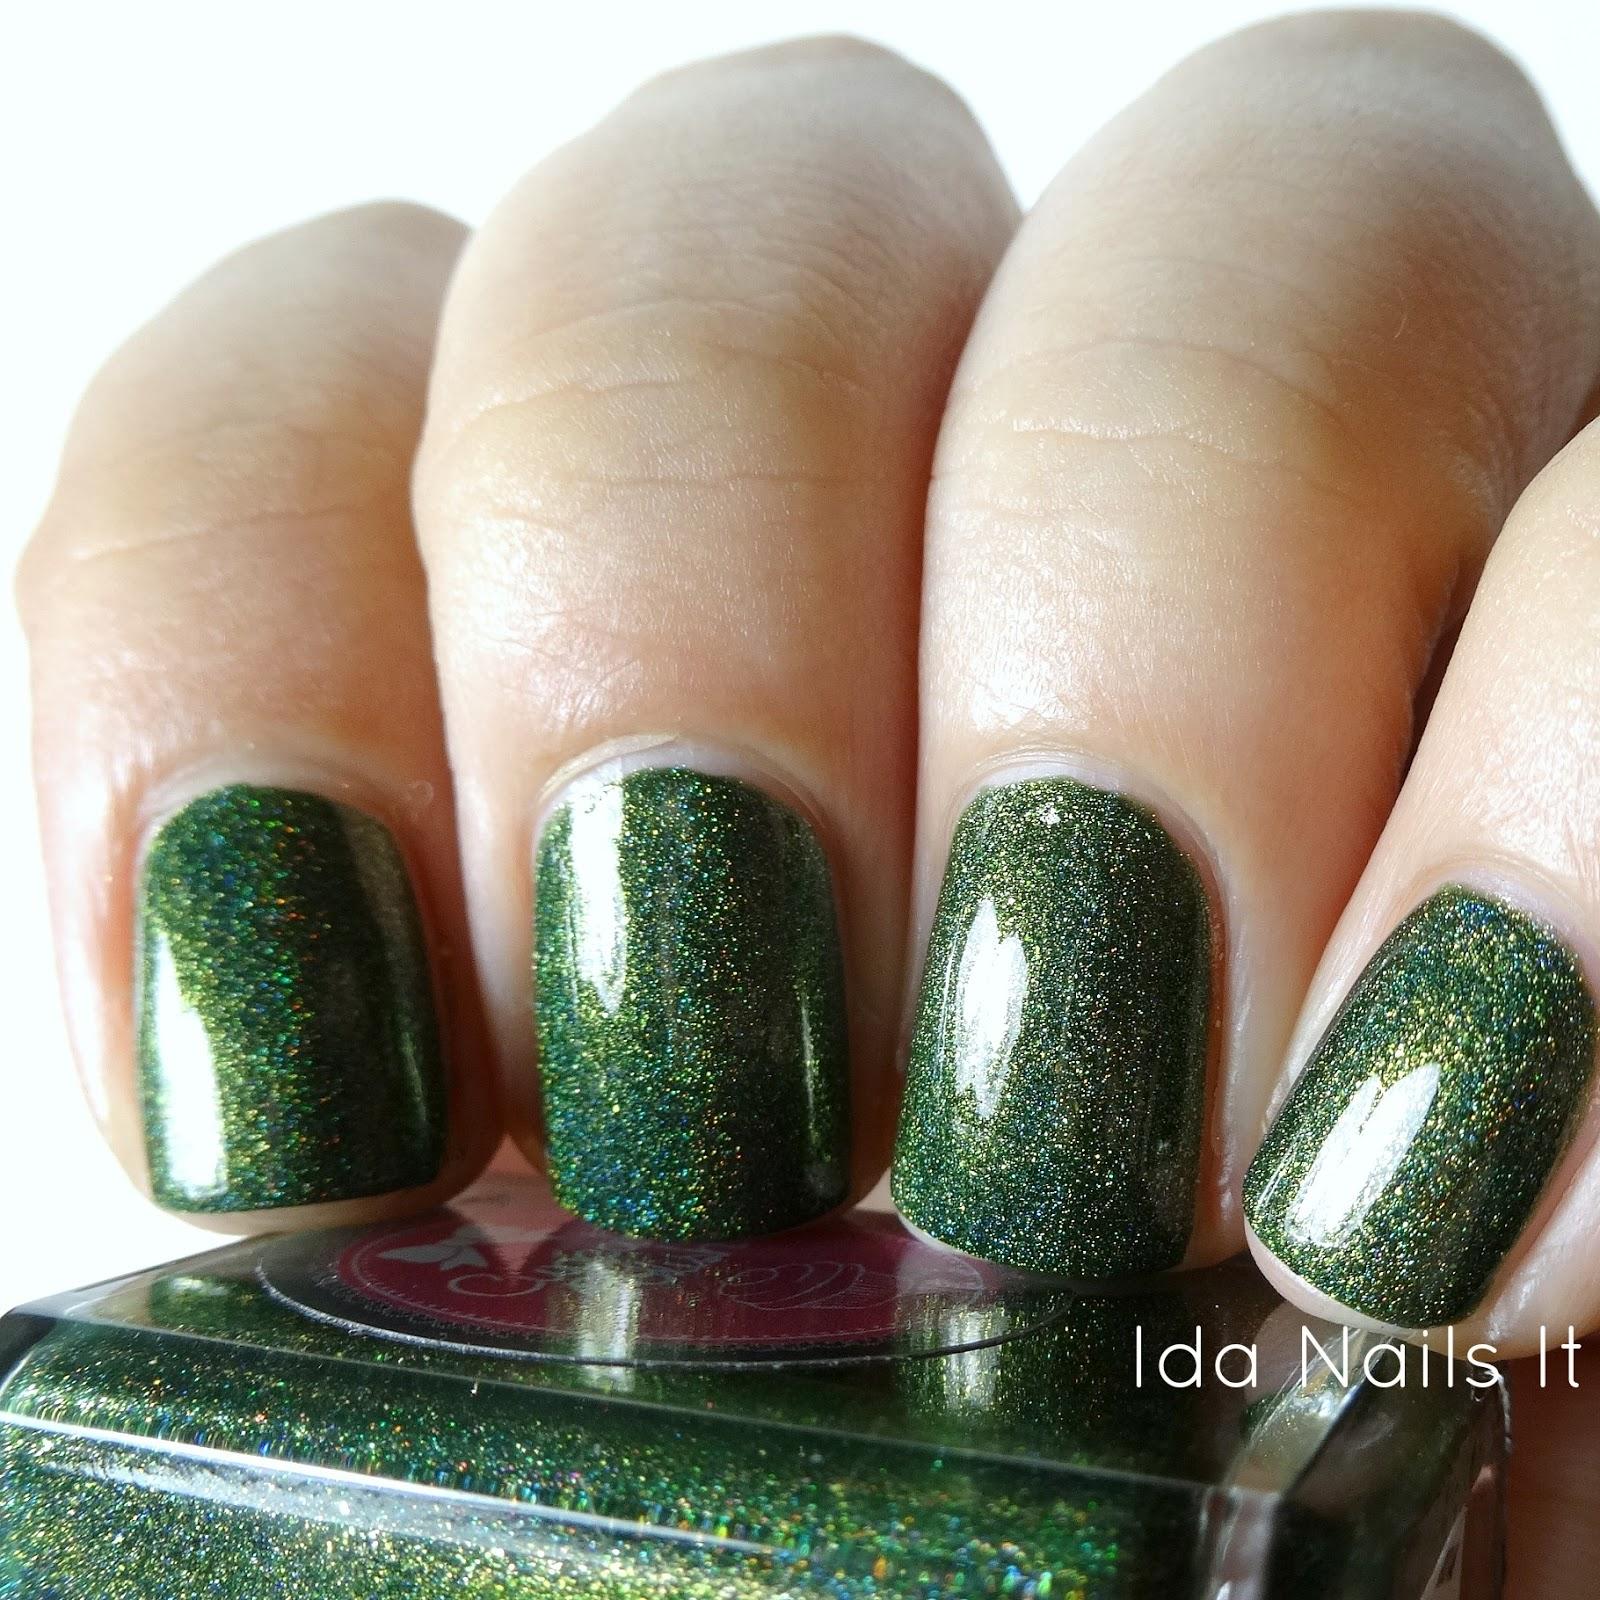 Ida Nails It: Cupcake Polish Fall Fancies Collection: Swatches and ...